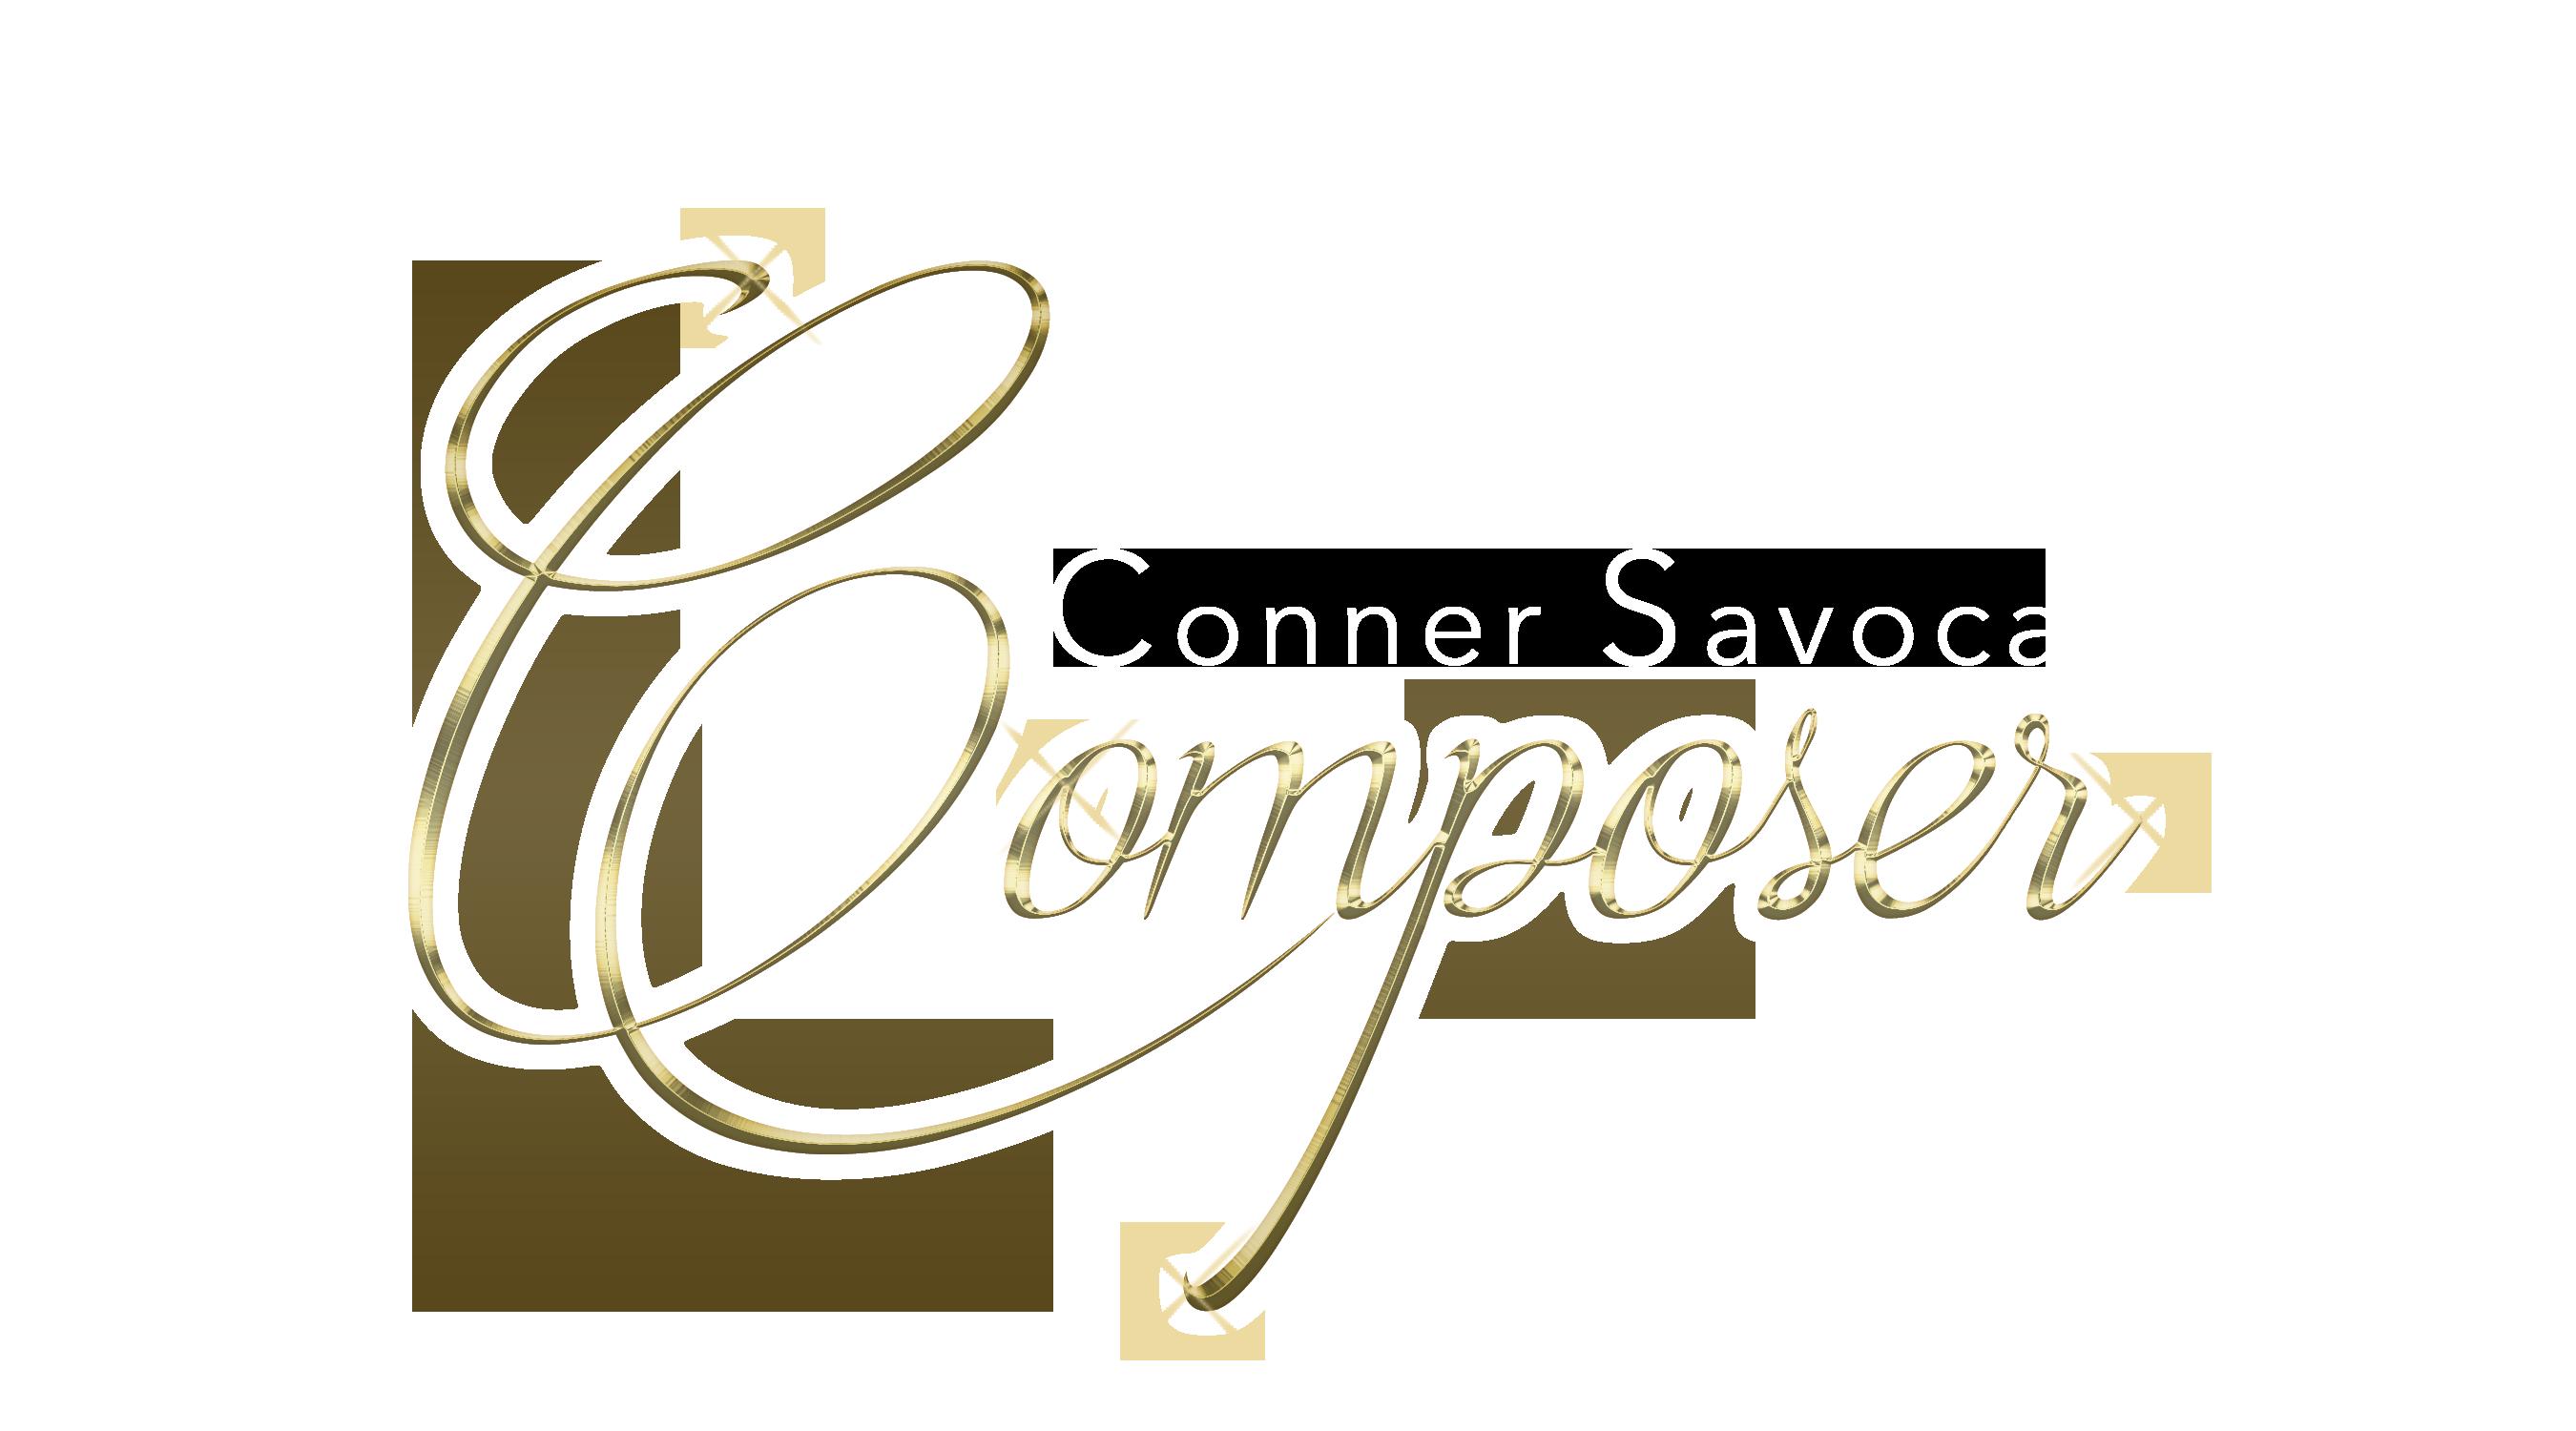 Conner Savoca